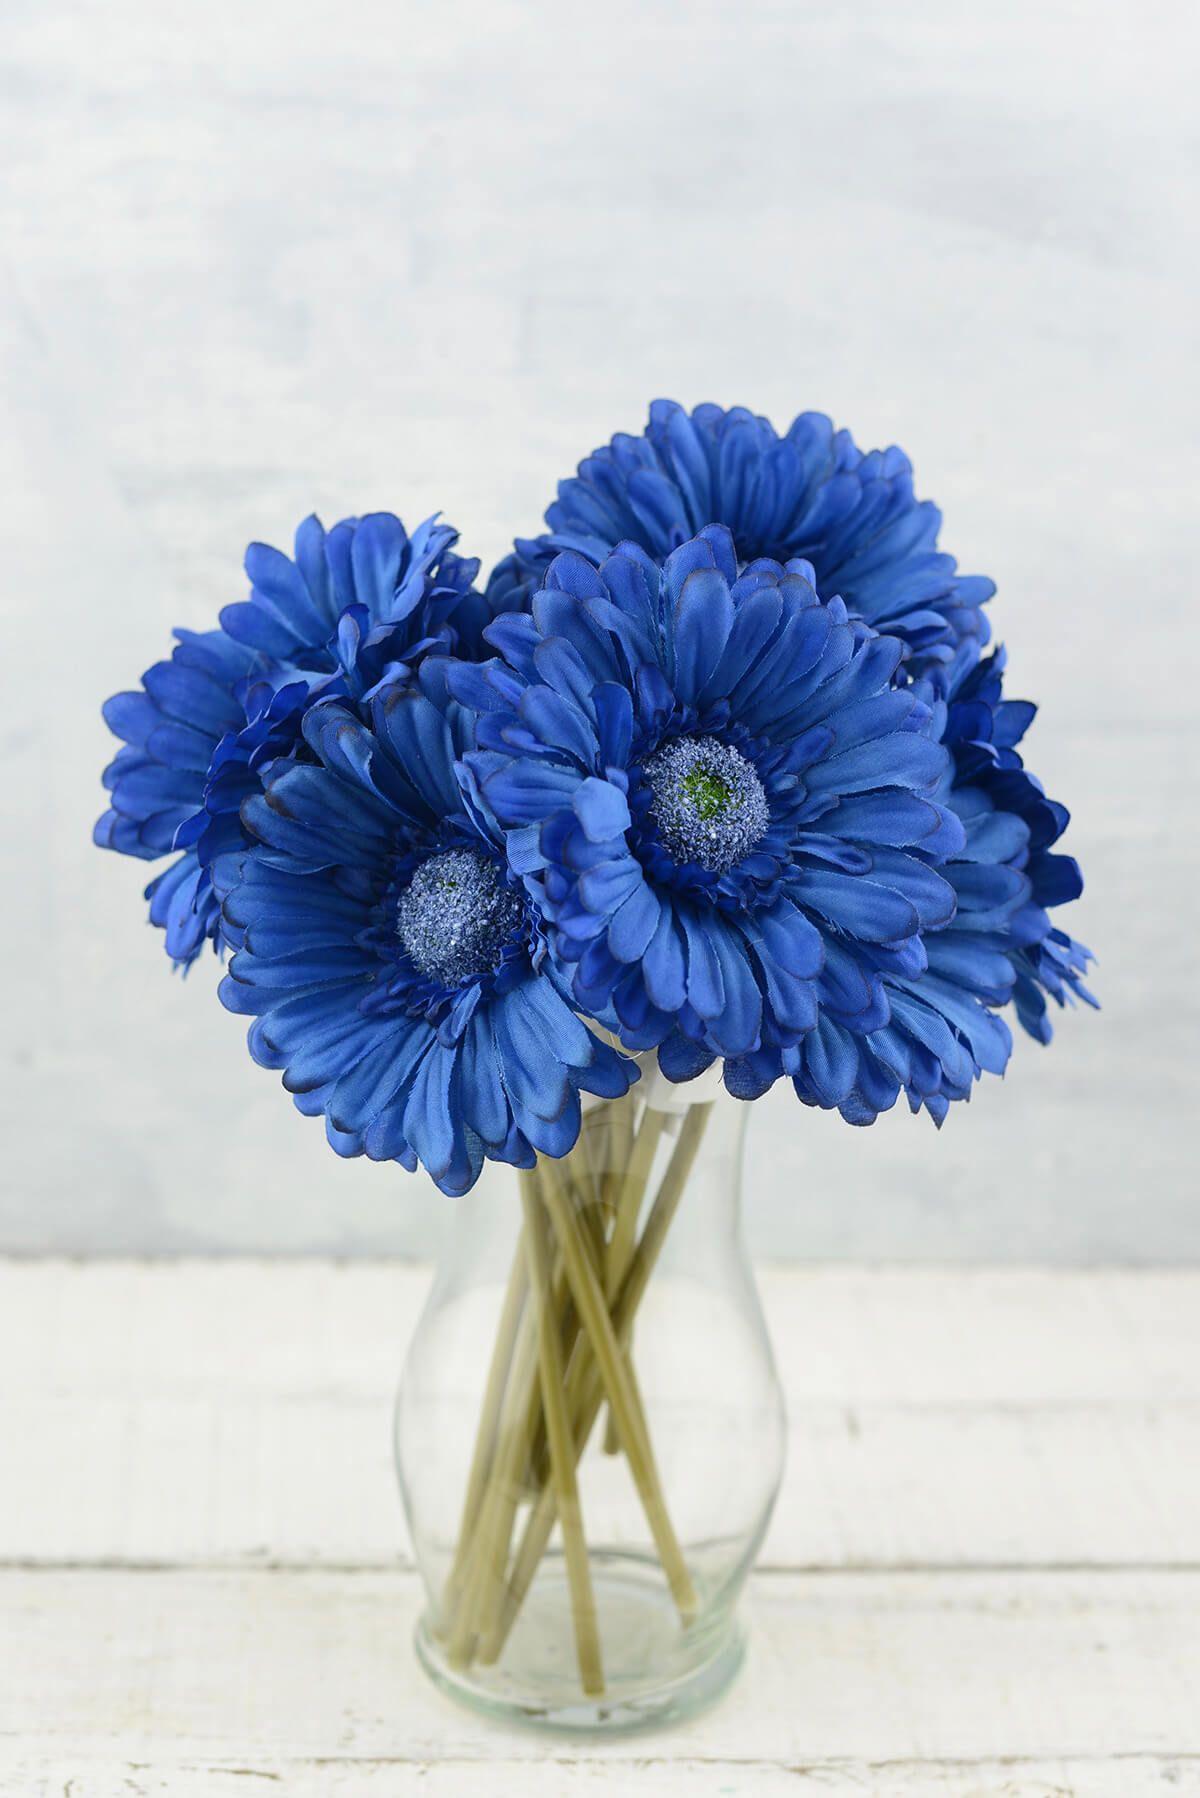 24 Blue Silk Gerbera Daisy Flowers Gerbera Daisy Gerbera Daisy Wedding Daisy Centerpieces